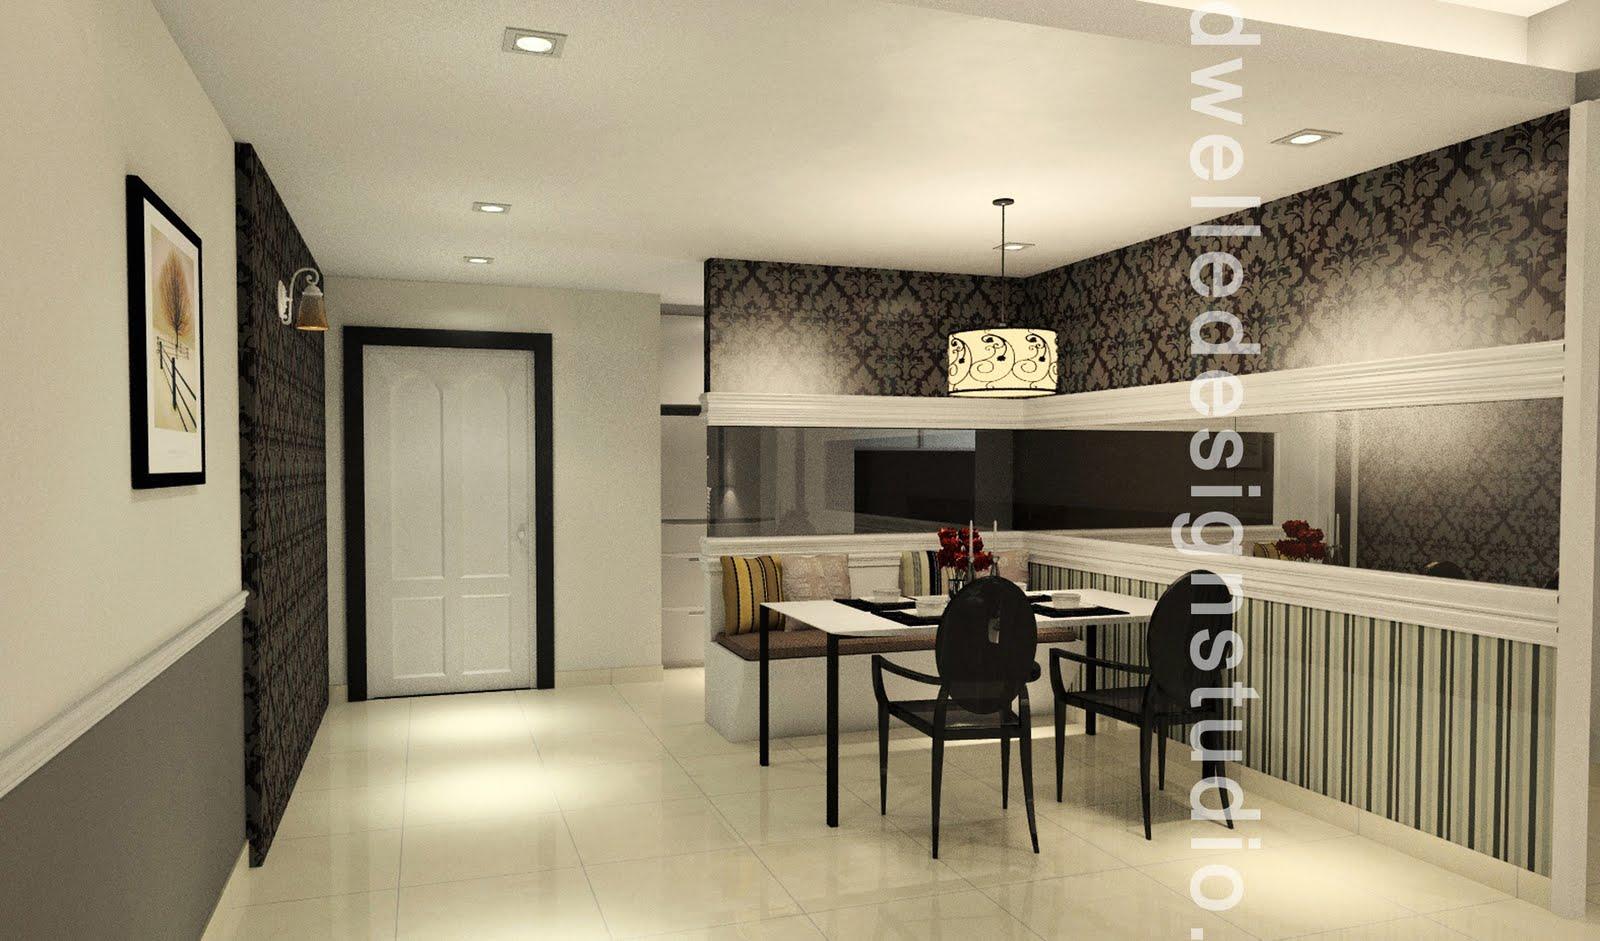 Condo With Loft Interior Design Joy Studio Design